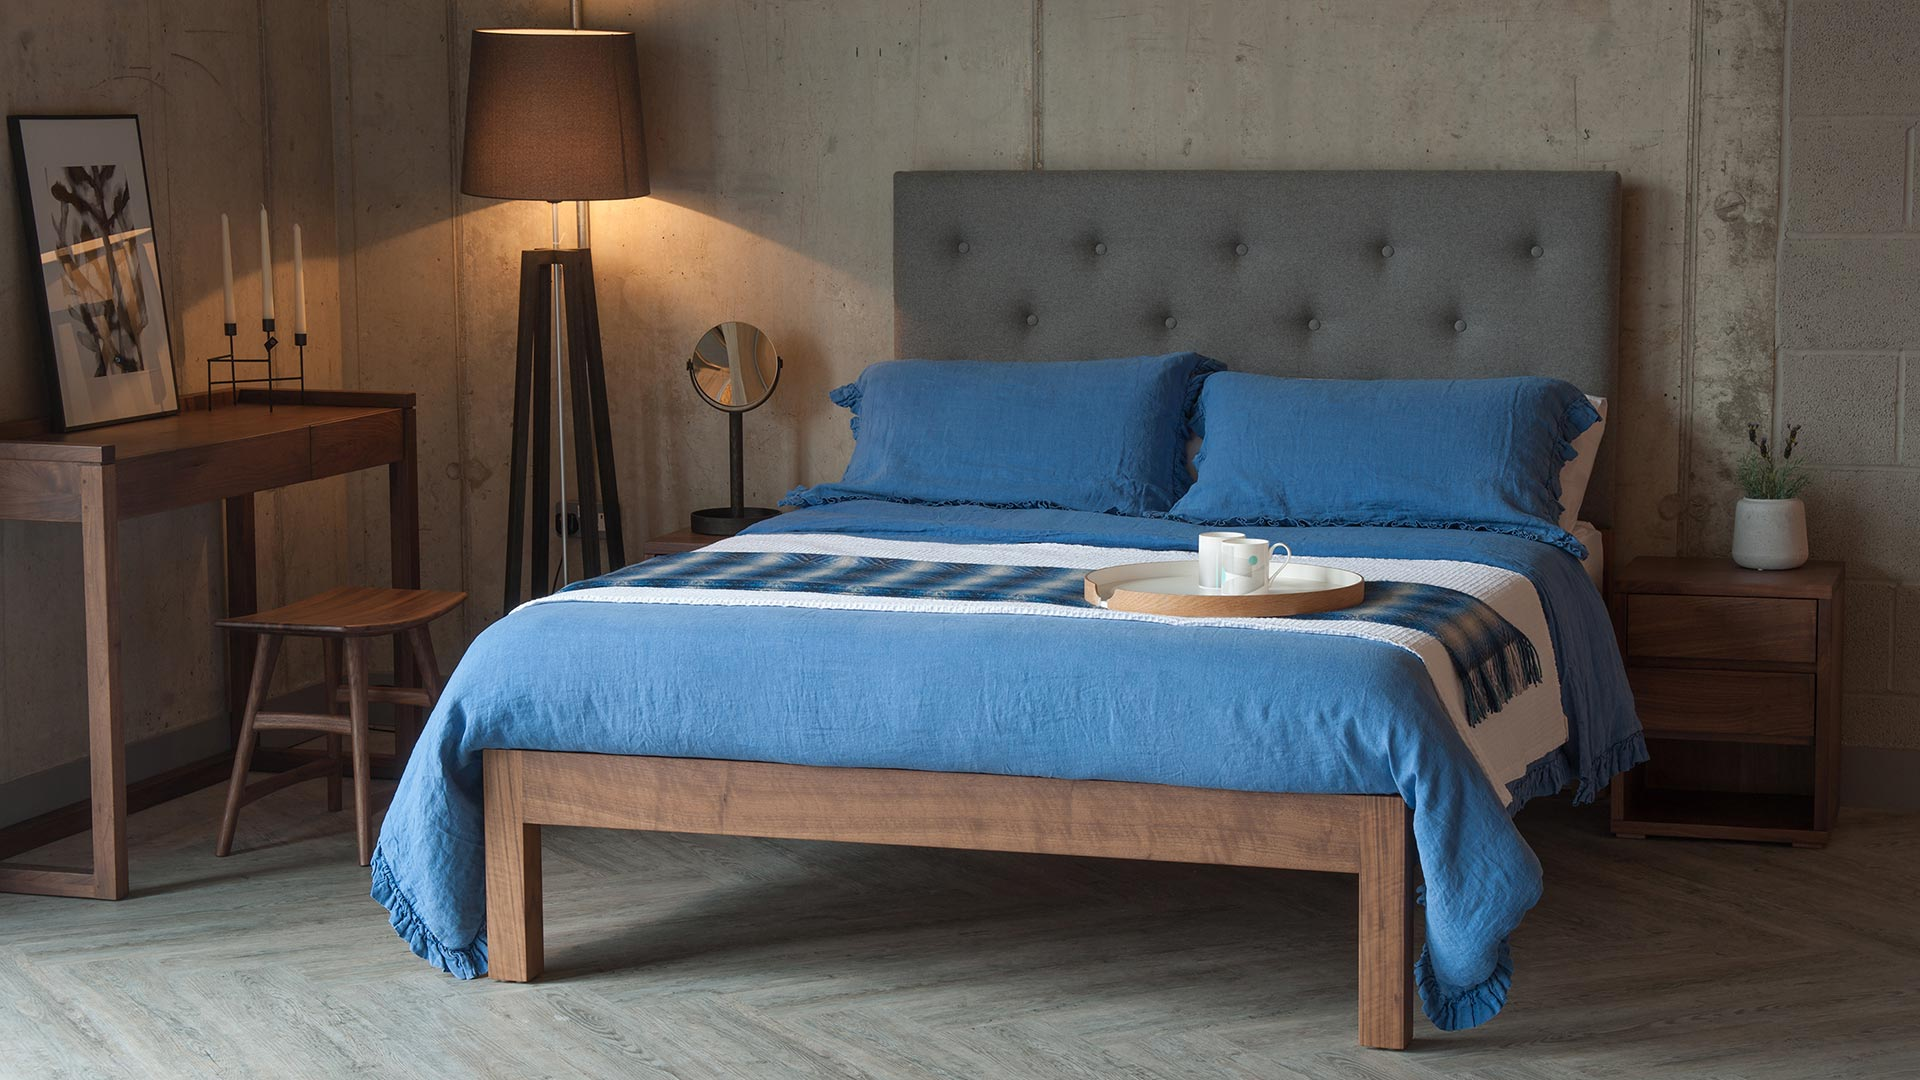 Classic taller wooden Skye bed with tall buttoned headboard & blue linen bedding